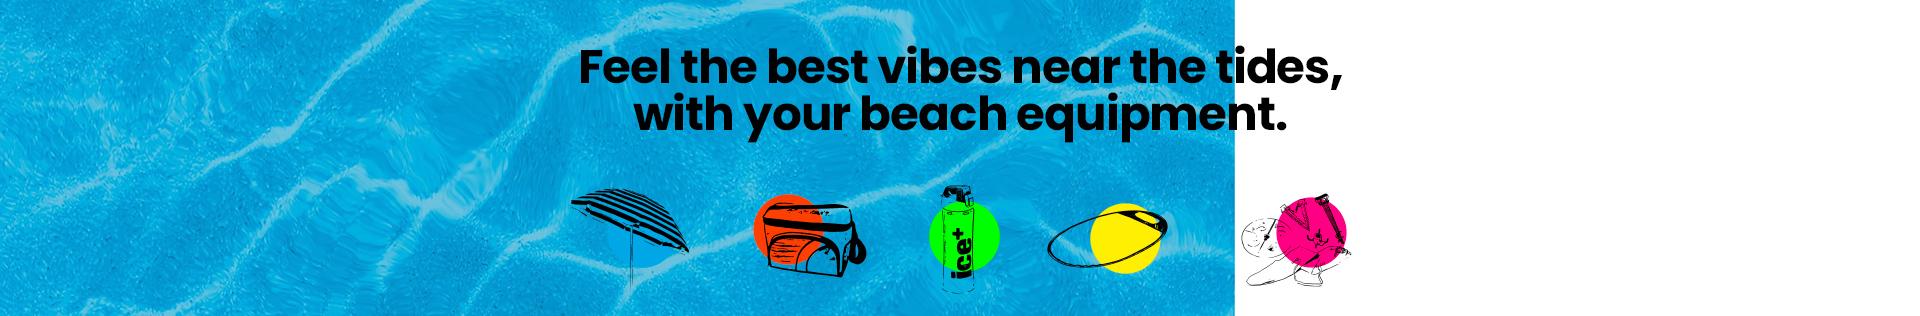 beachline banner